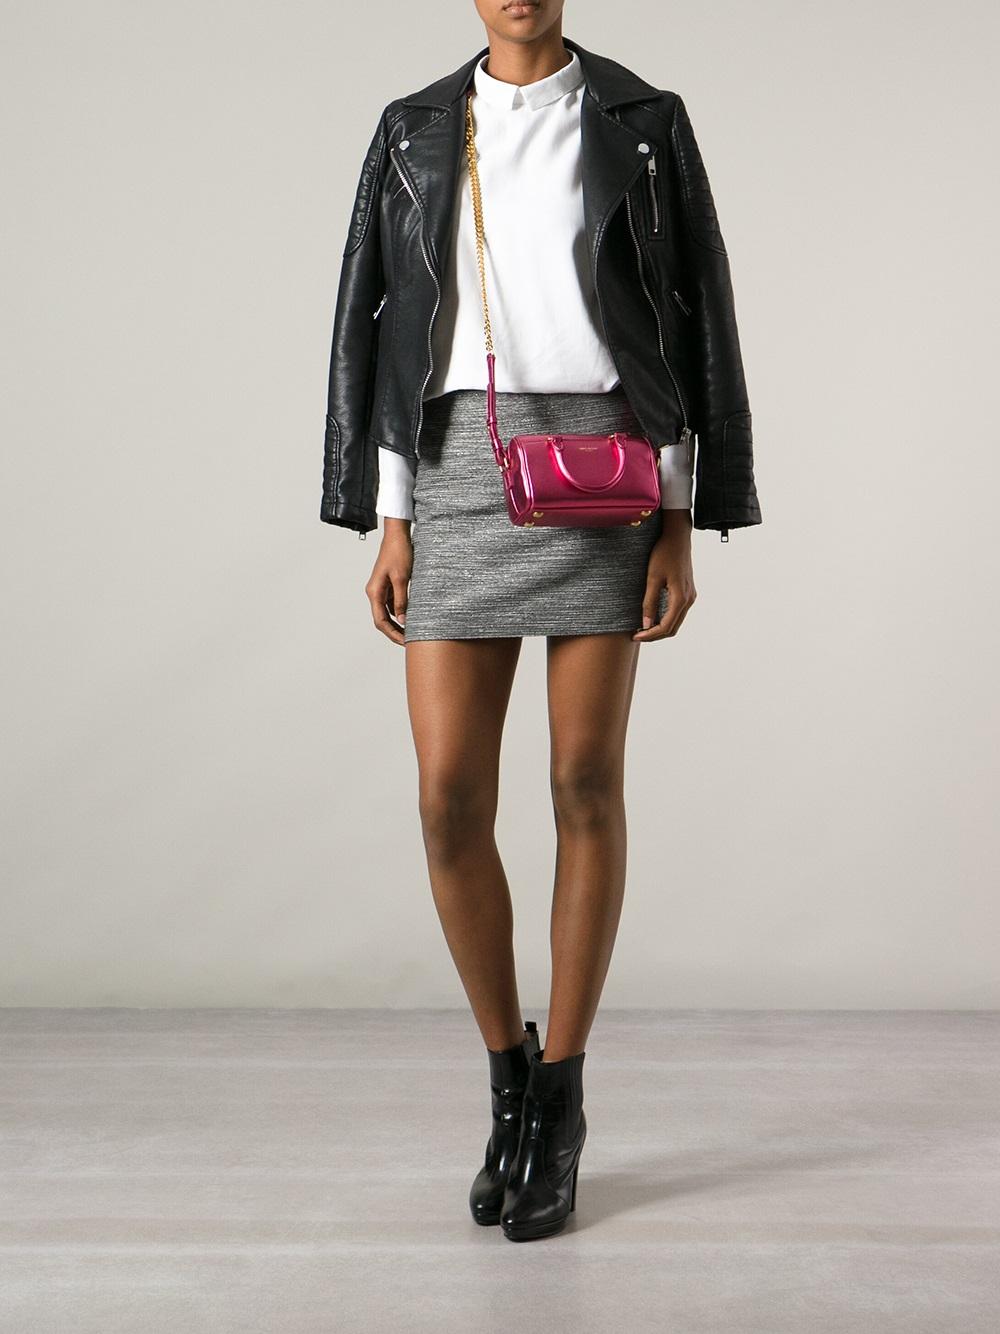 f9675913da0 Saint Laurent Mini Duffle Bag in Pink - Lyst